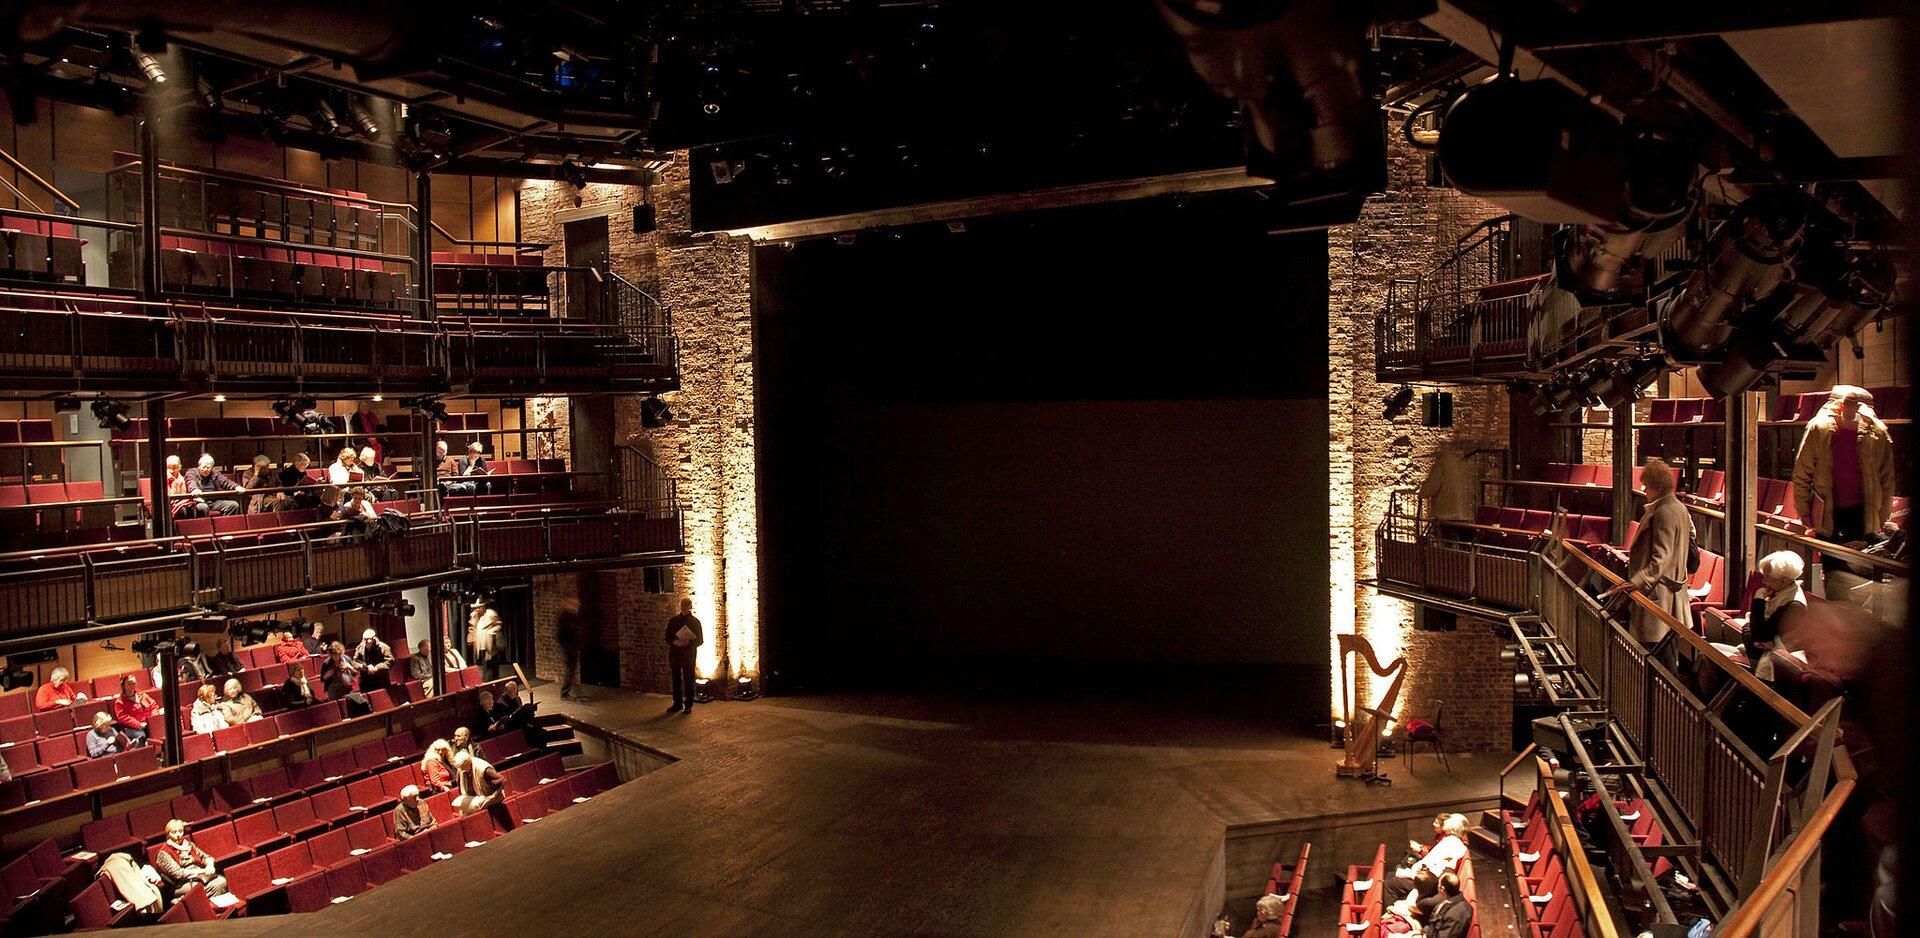 Royal Shakespeare Theatre Teatr Globe wLondynie Źródło: Tony Hisgett, Royal Shakespeare Theatre, 2010, fotografia, licencja: CC BY 2.0.